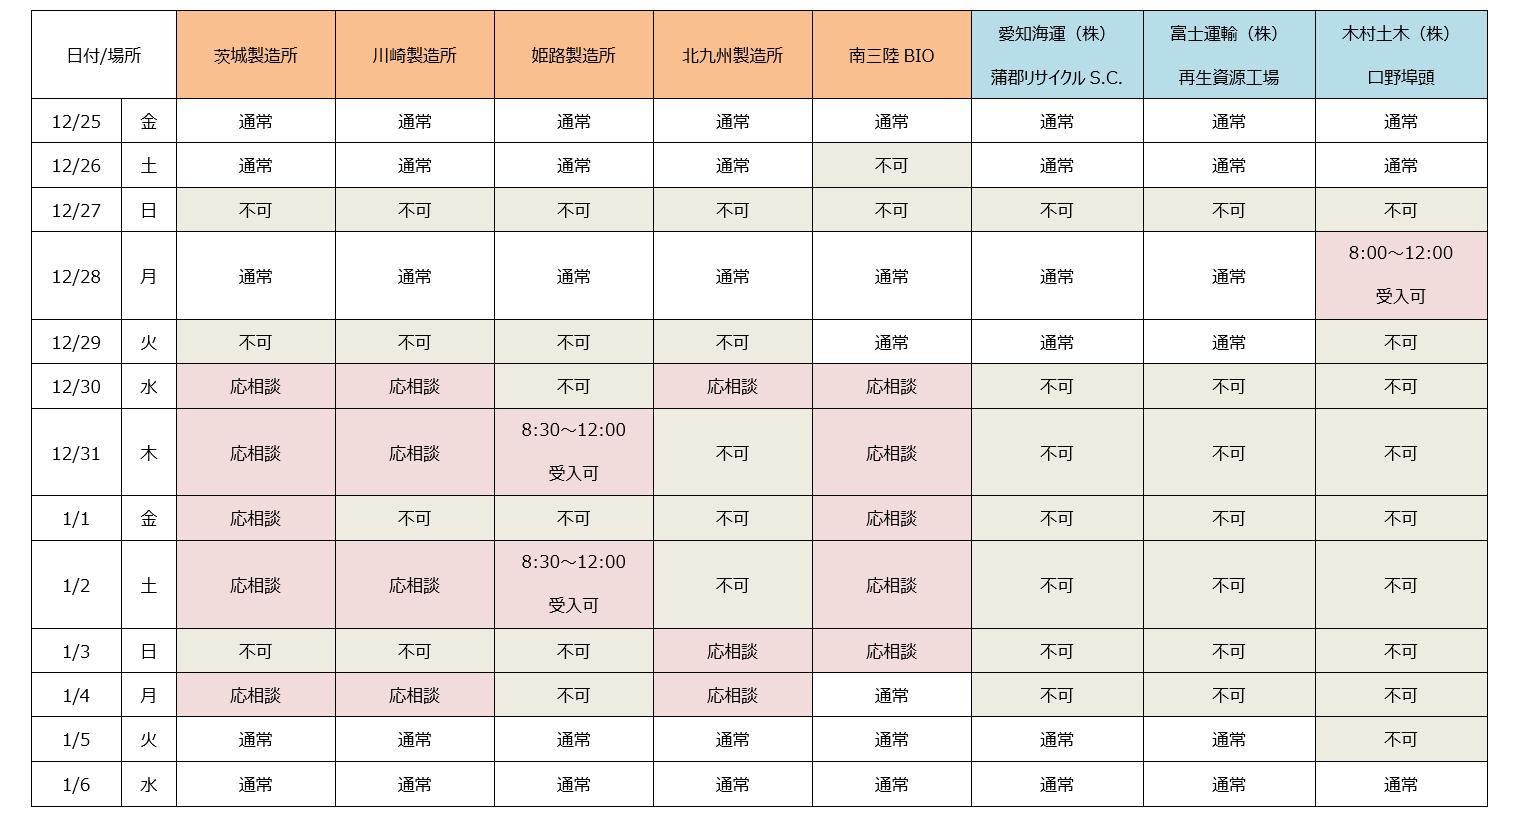 https://www.amita-hd.co.jp/news/images/schedule_2020_last.png